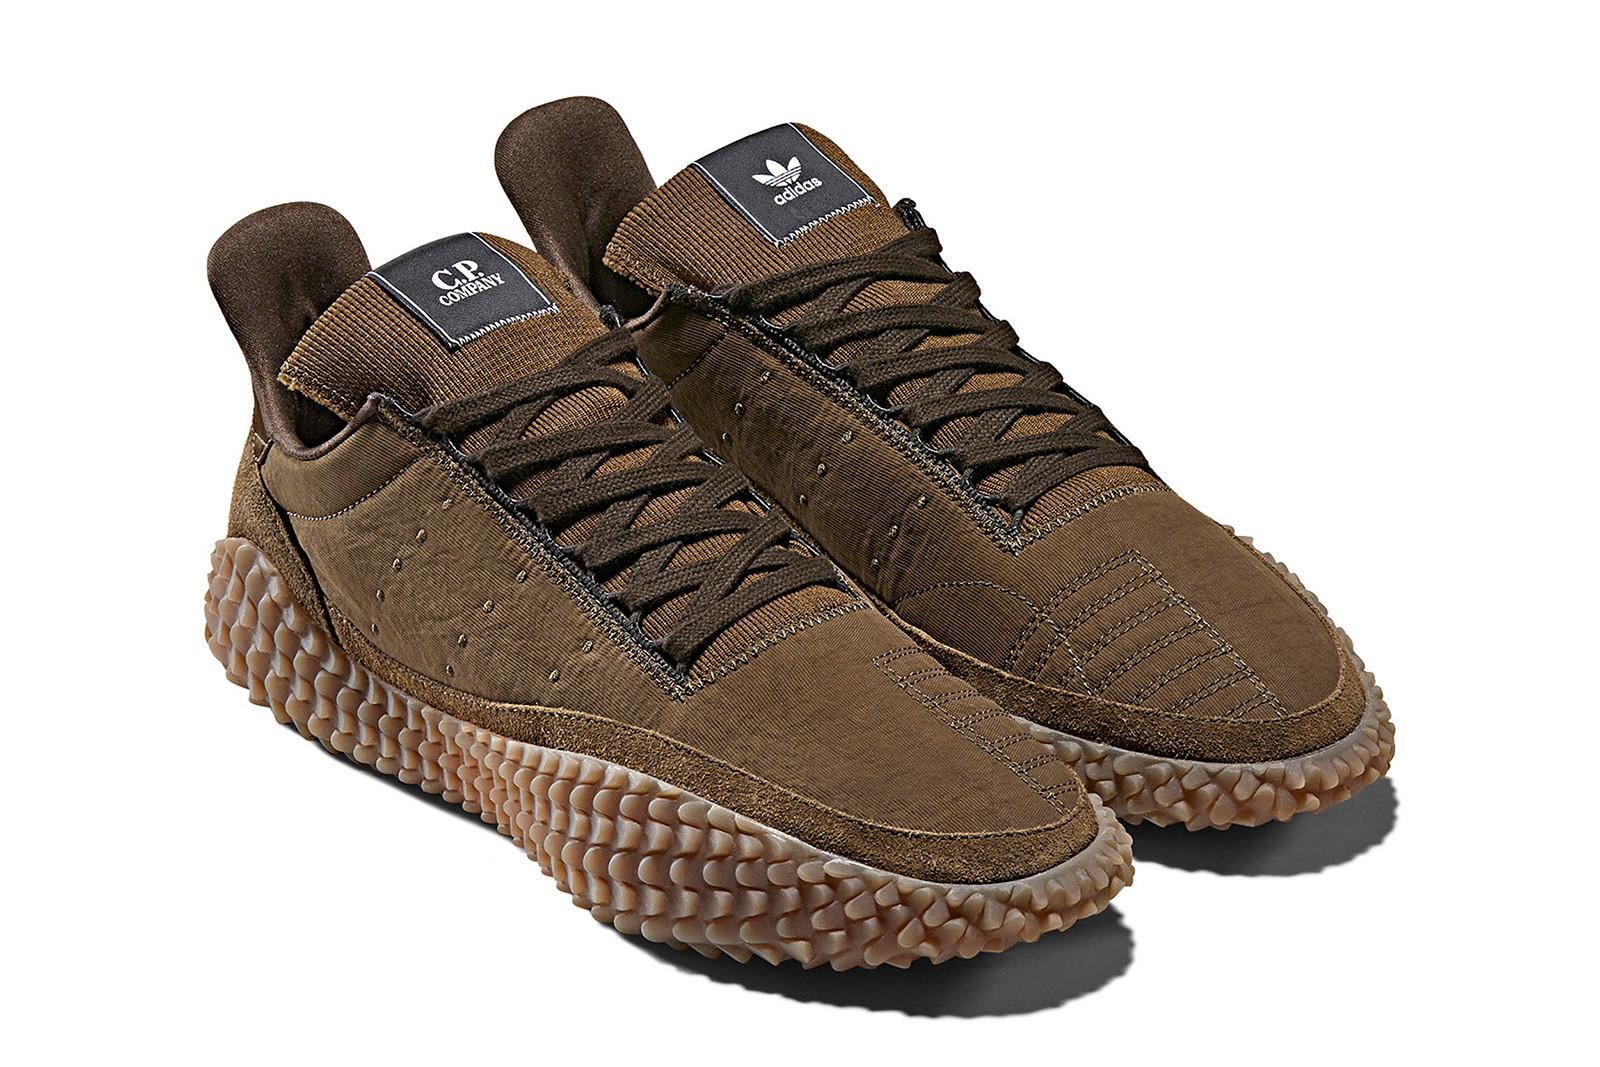 adidas_c_p_company_collab_dtf_6